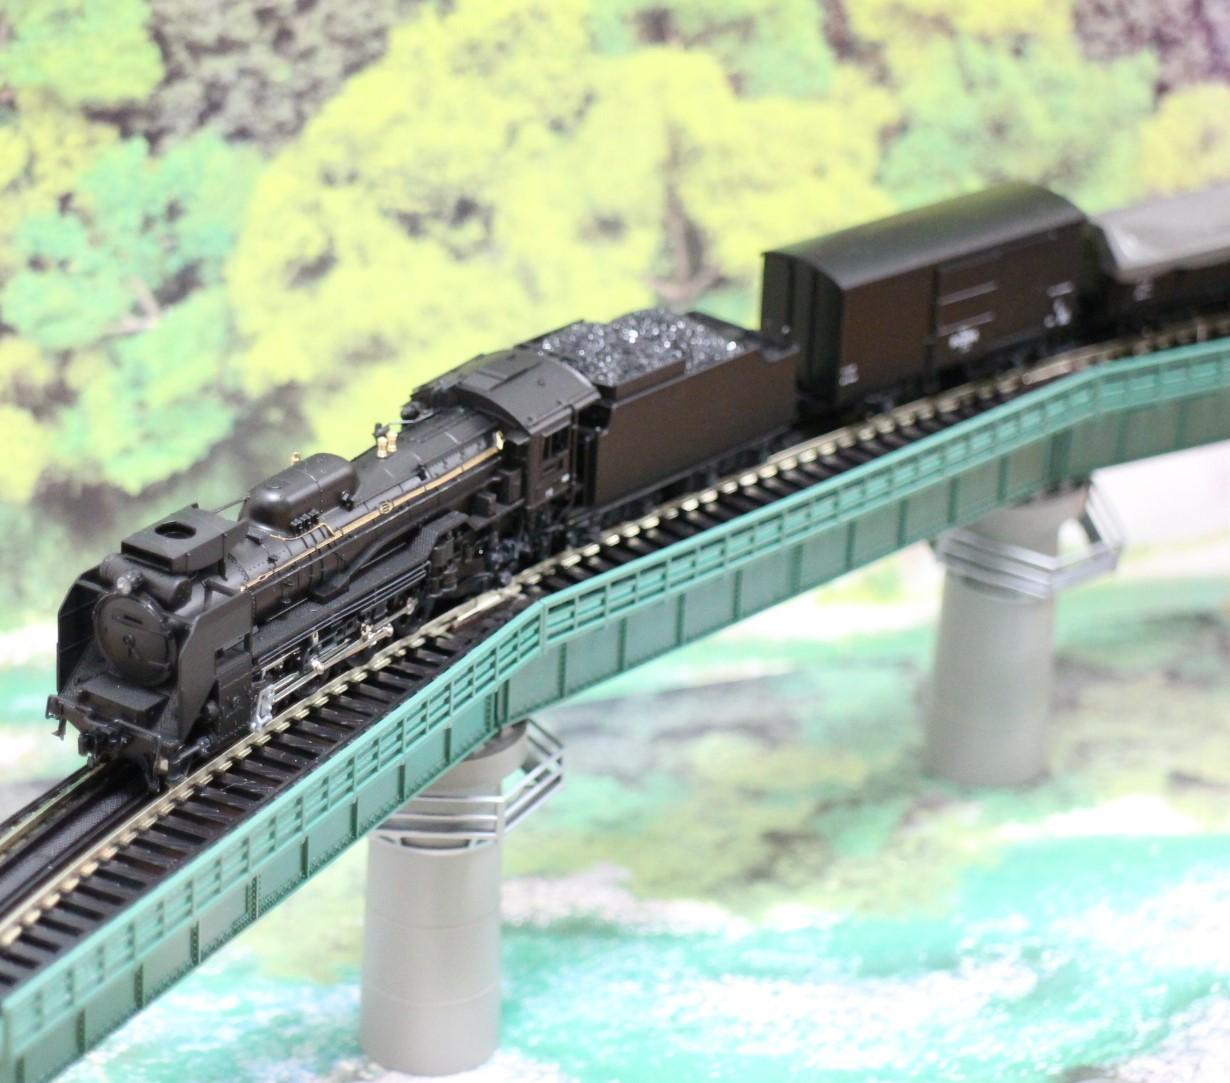 KATO のカーブ鉄橋セットを使い楽しんでみる!_a0149148_10324103.jpg